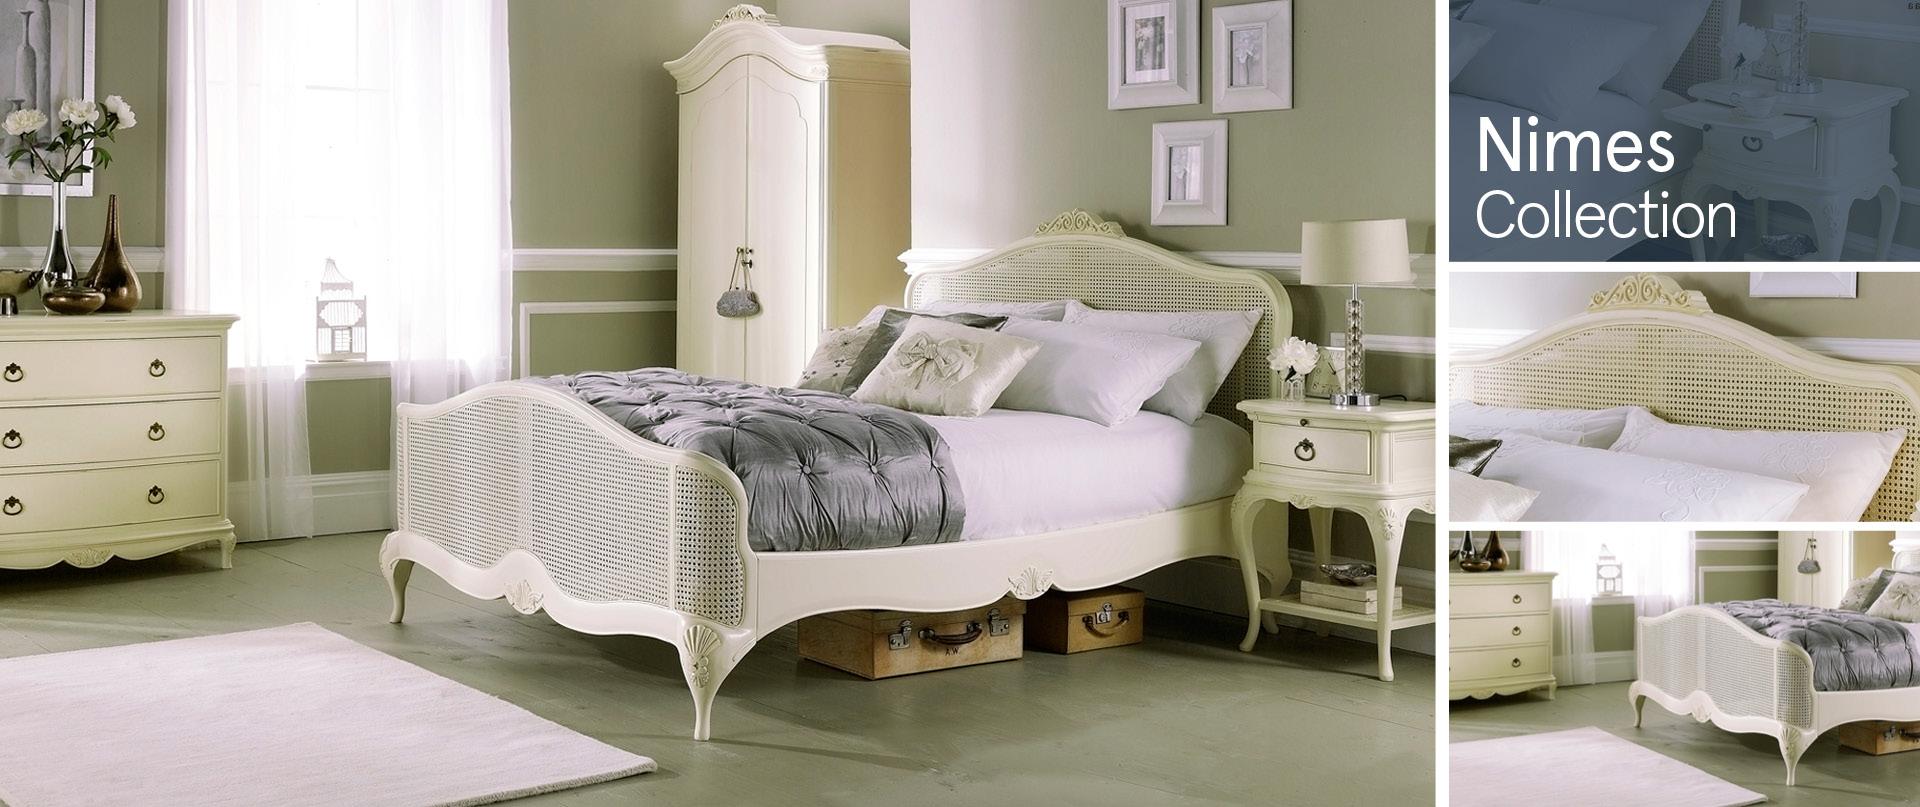 Nimes Bedroom Furniture Ranges